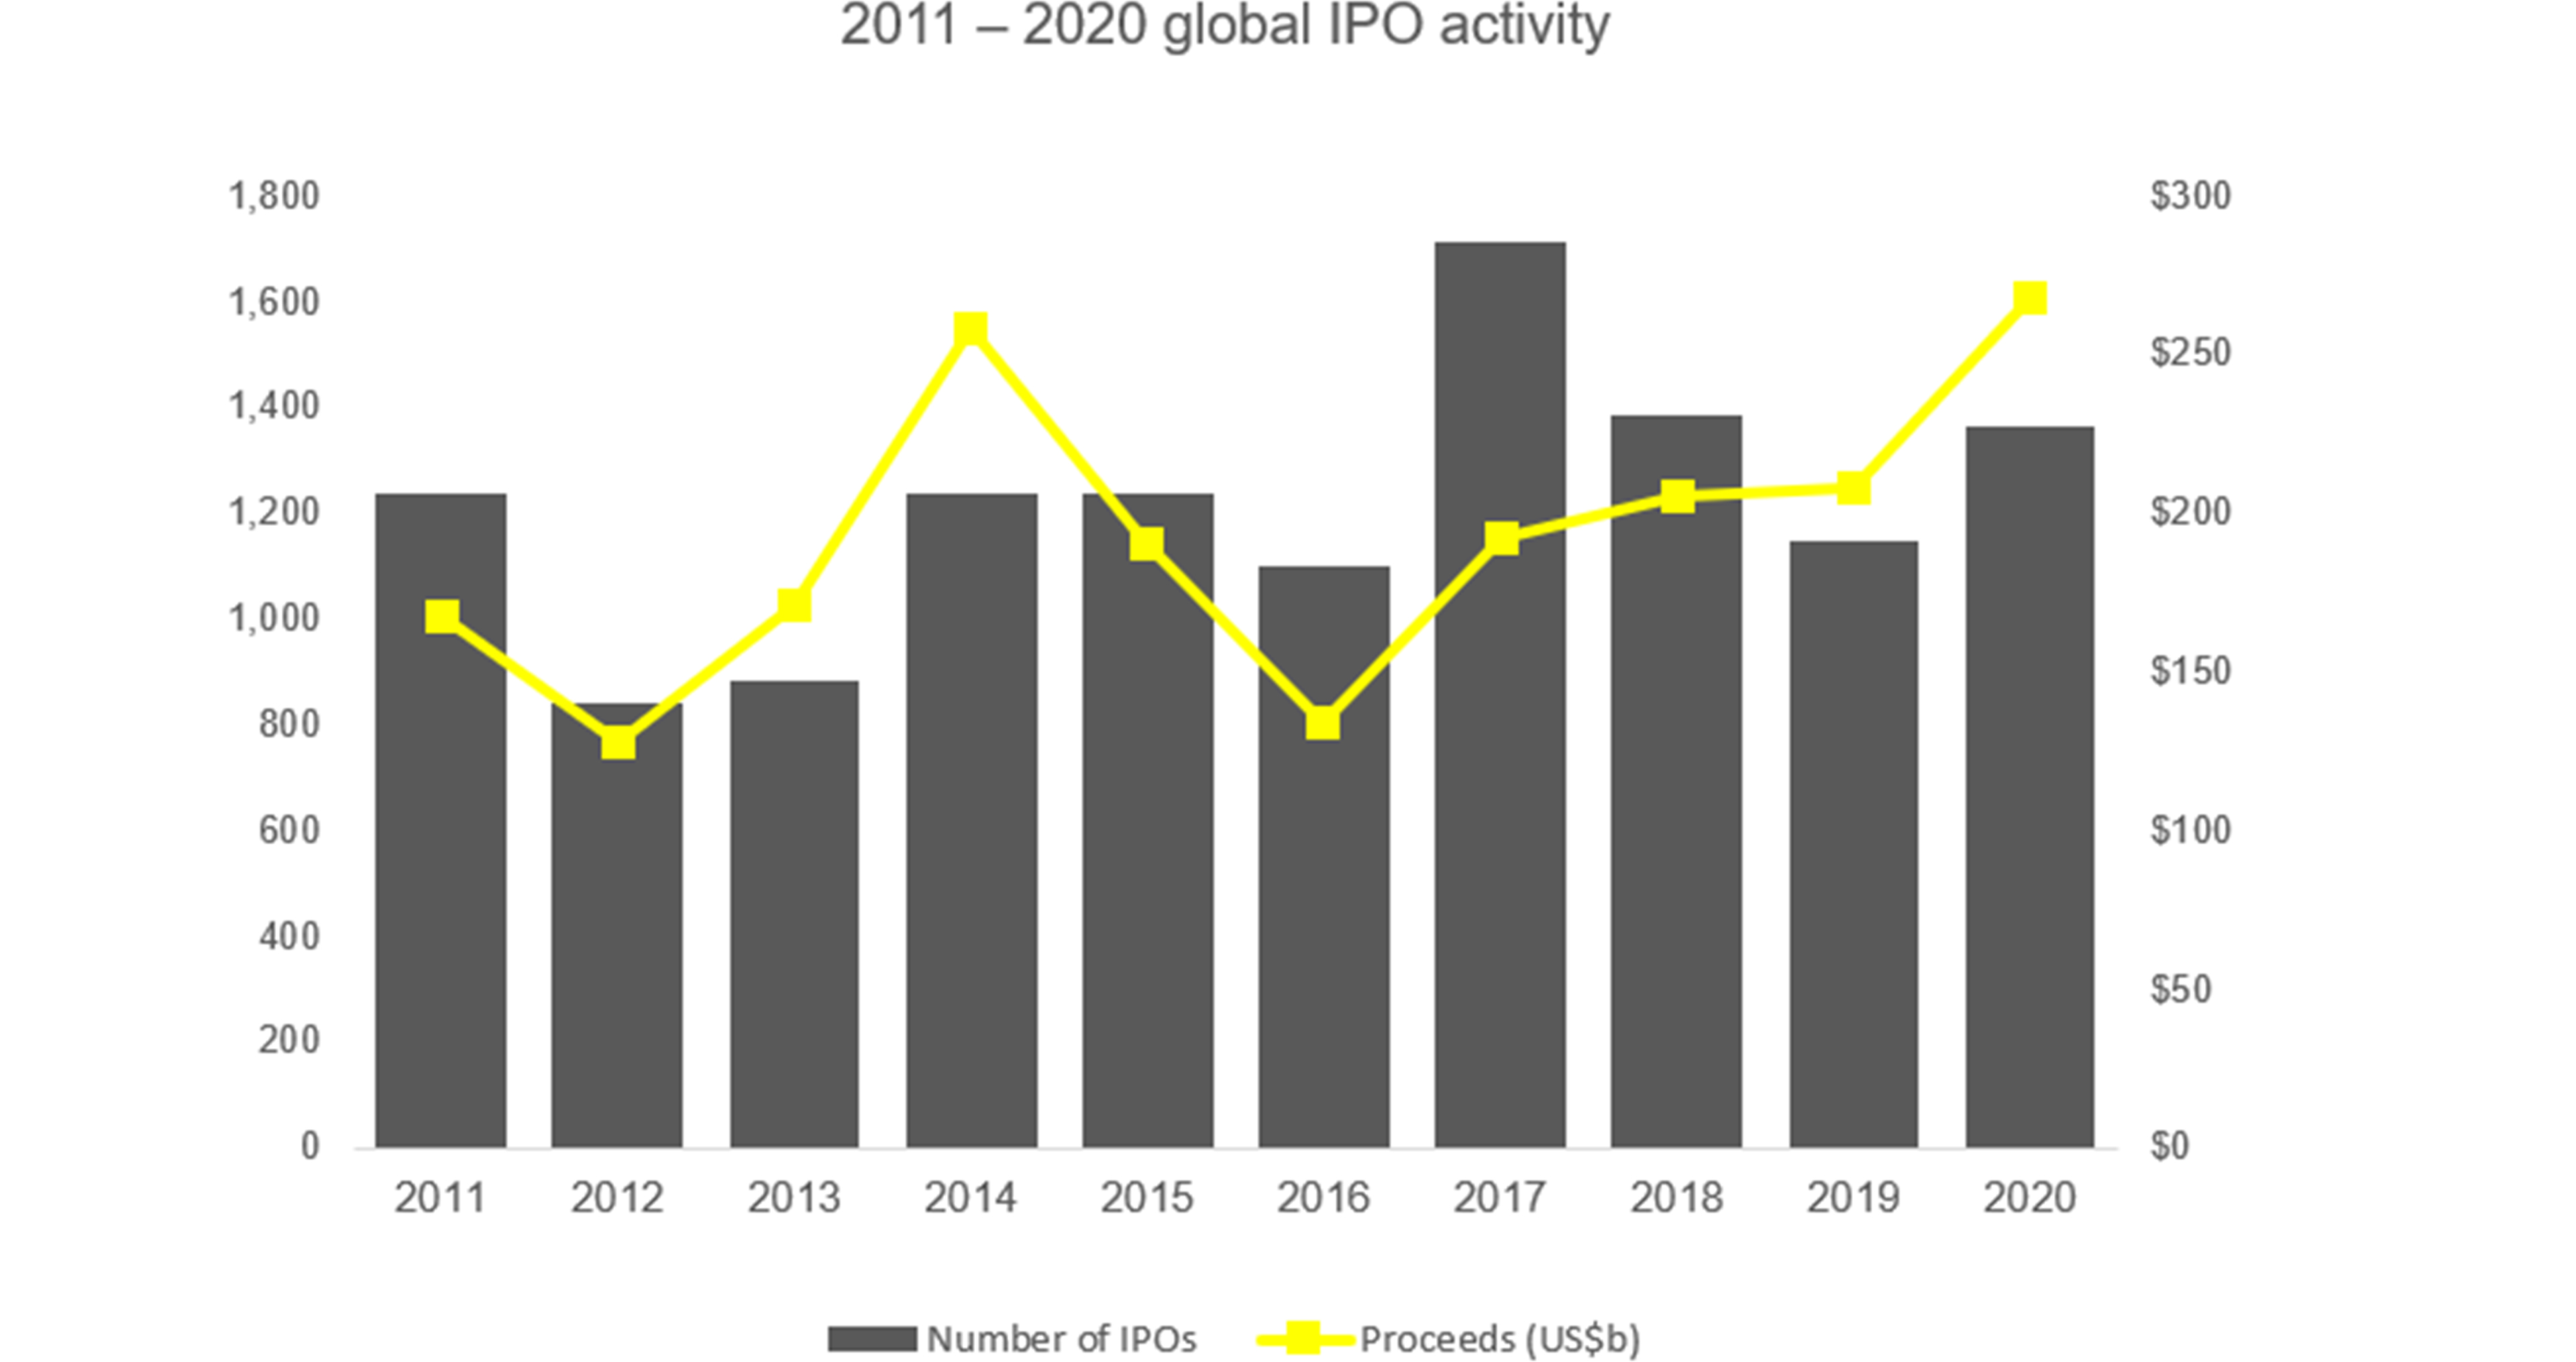 2011 -2020 global IPO activity